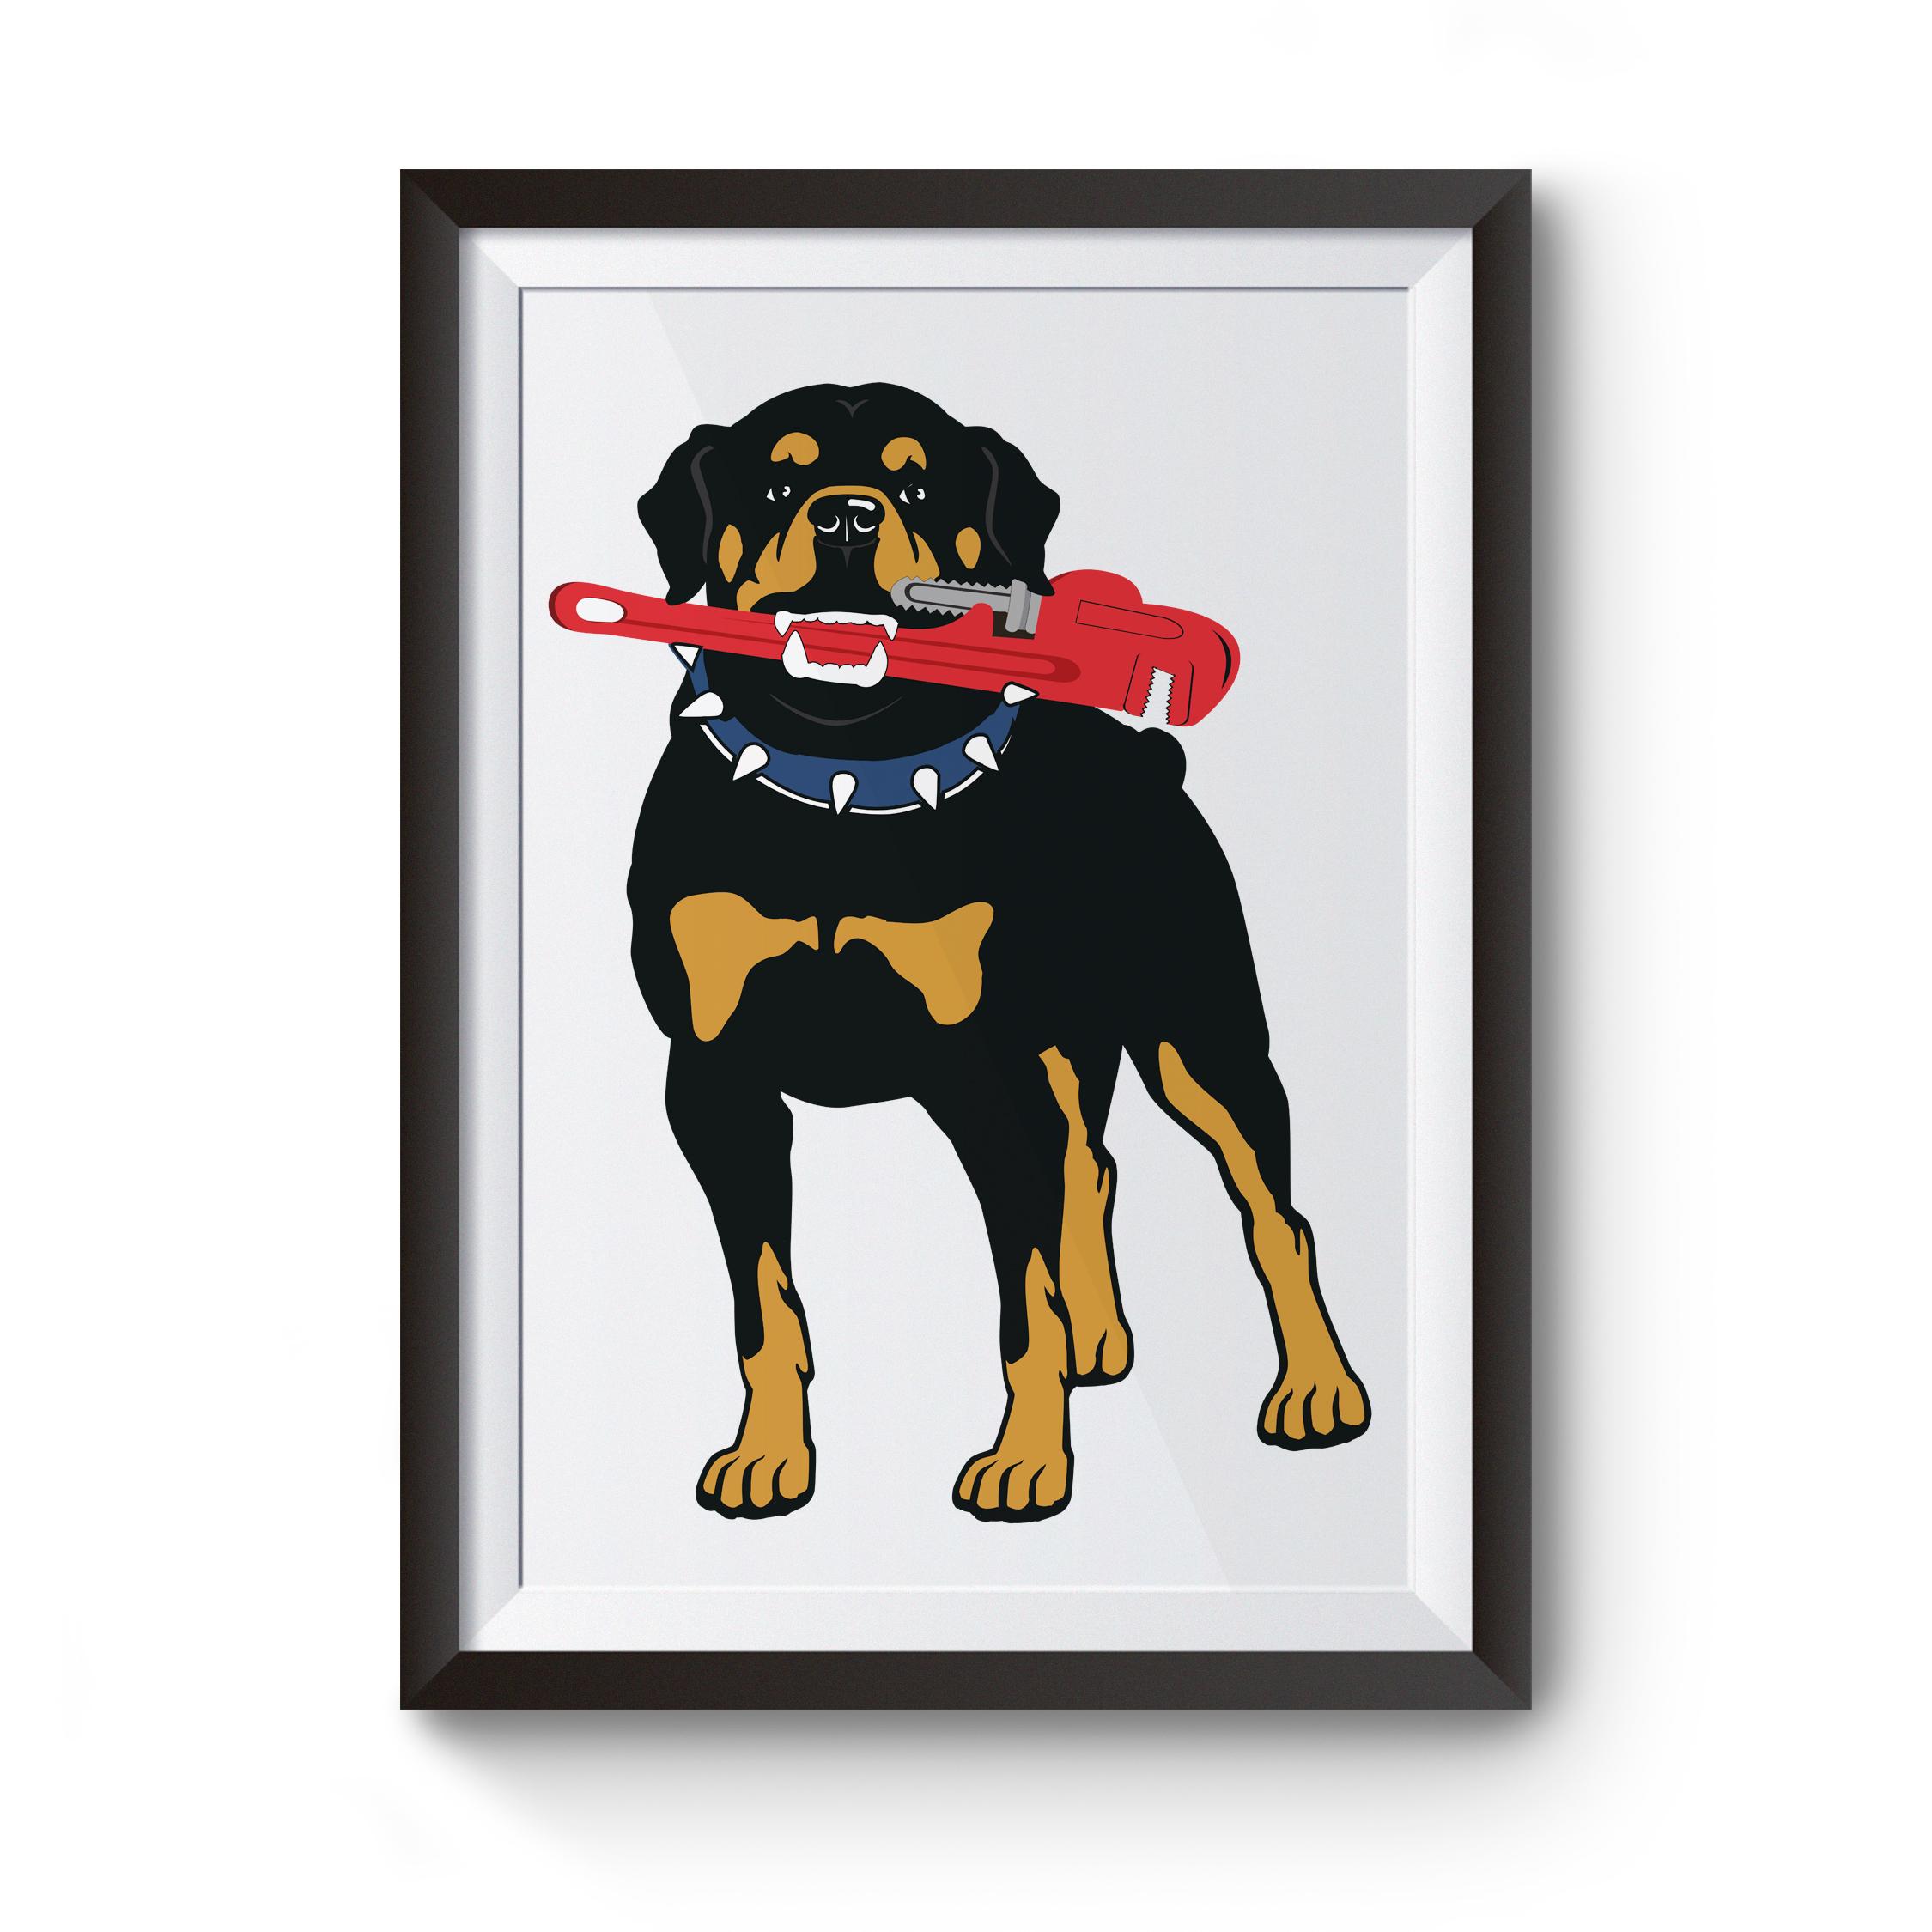 blackdog_illustration_artwork.jpg